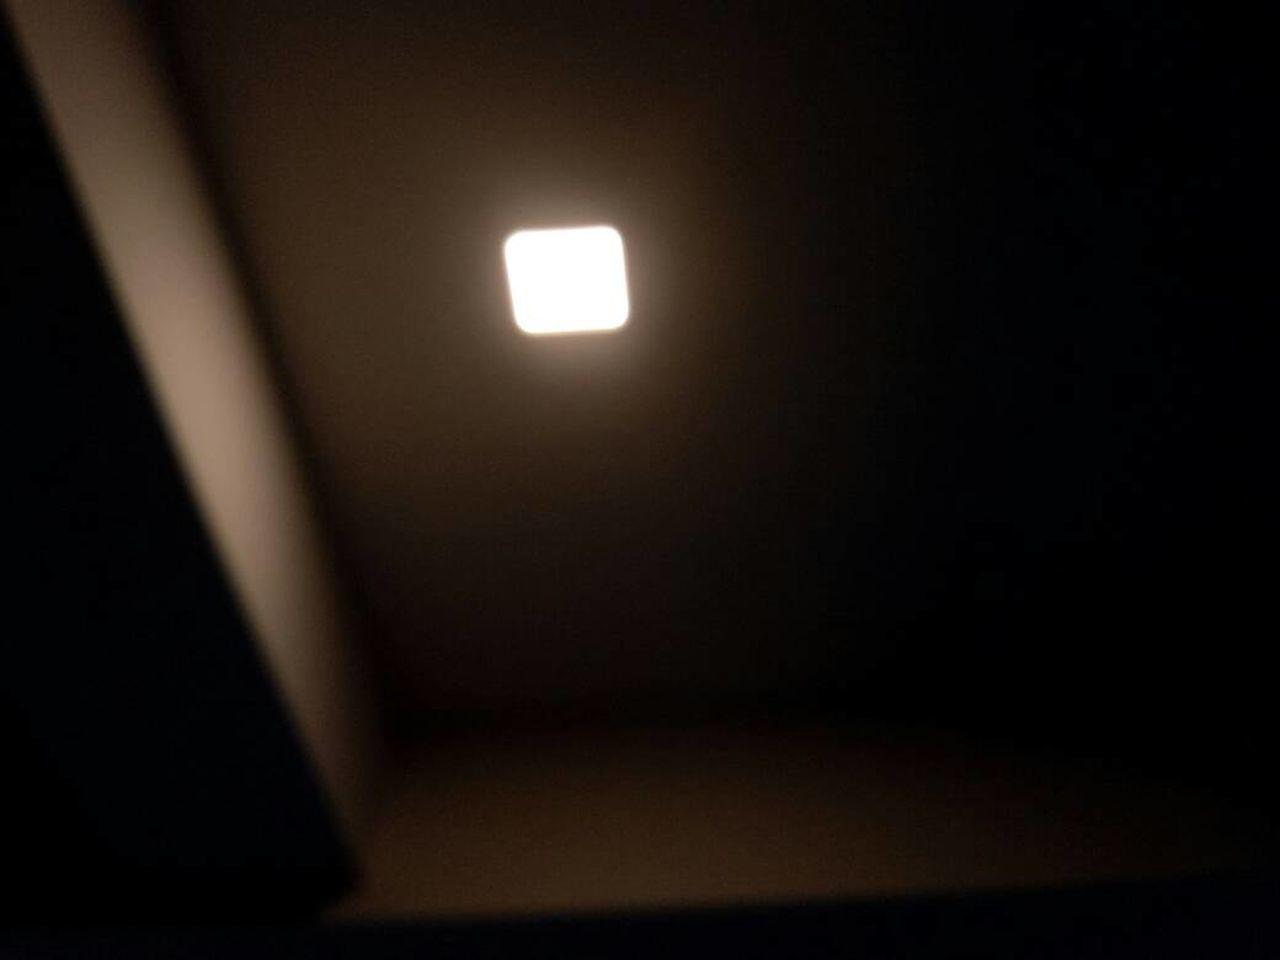 illuminated, lighting equipment, dark, indoors, night, spotlight, no people, cellar